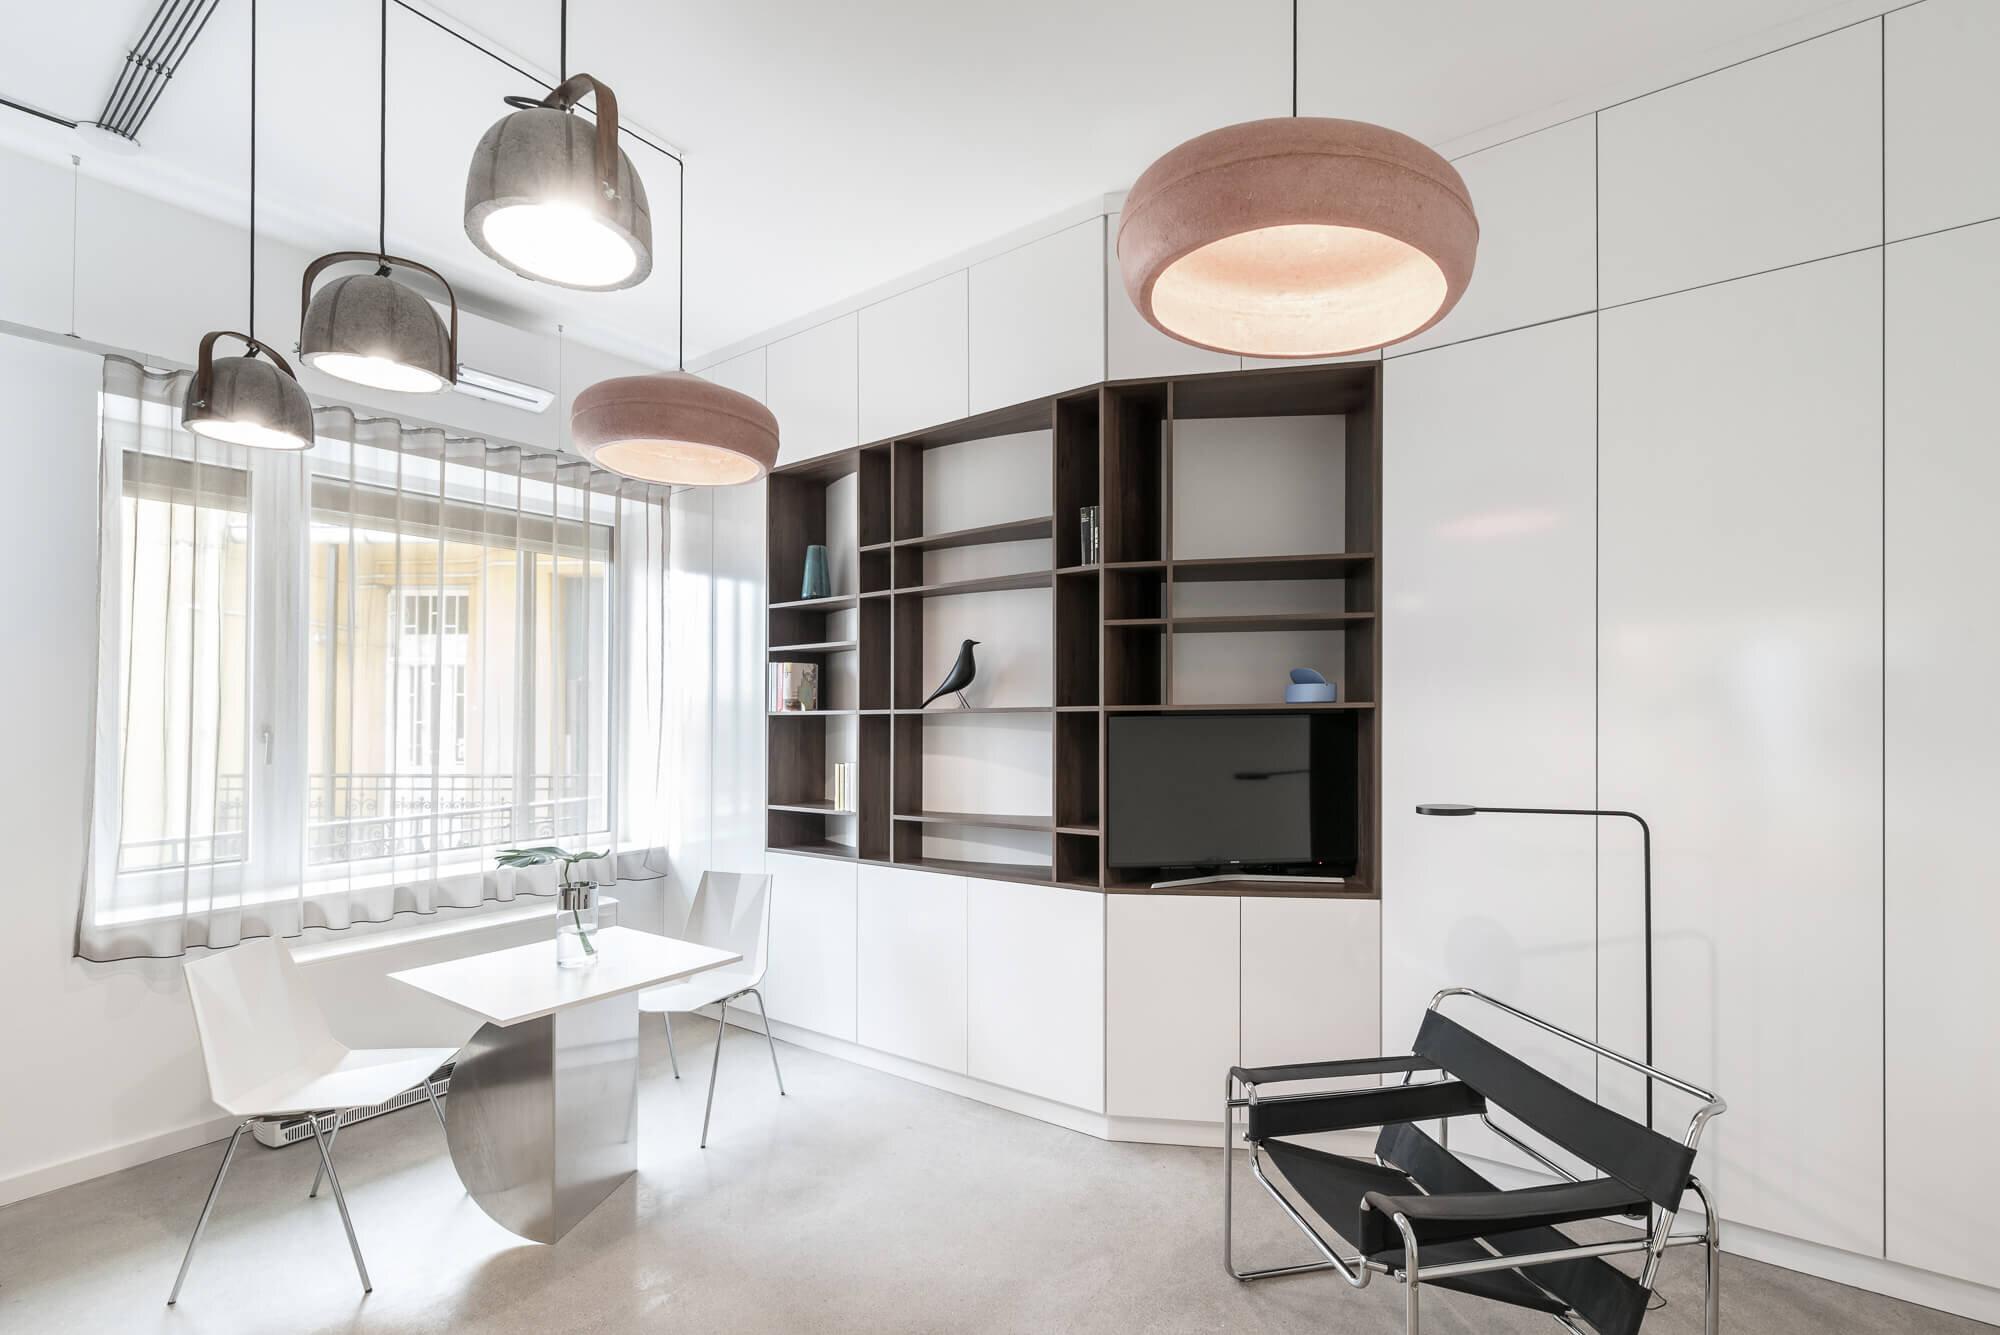 Translucent-spaces-batlab-architects-Hungary-4